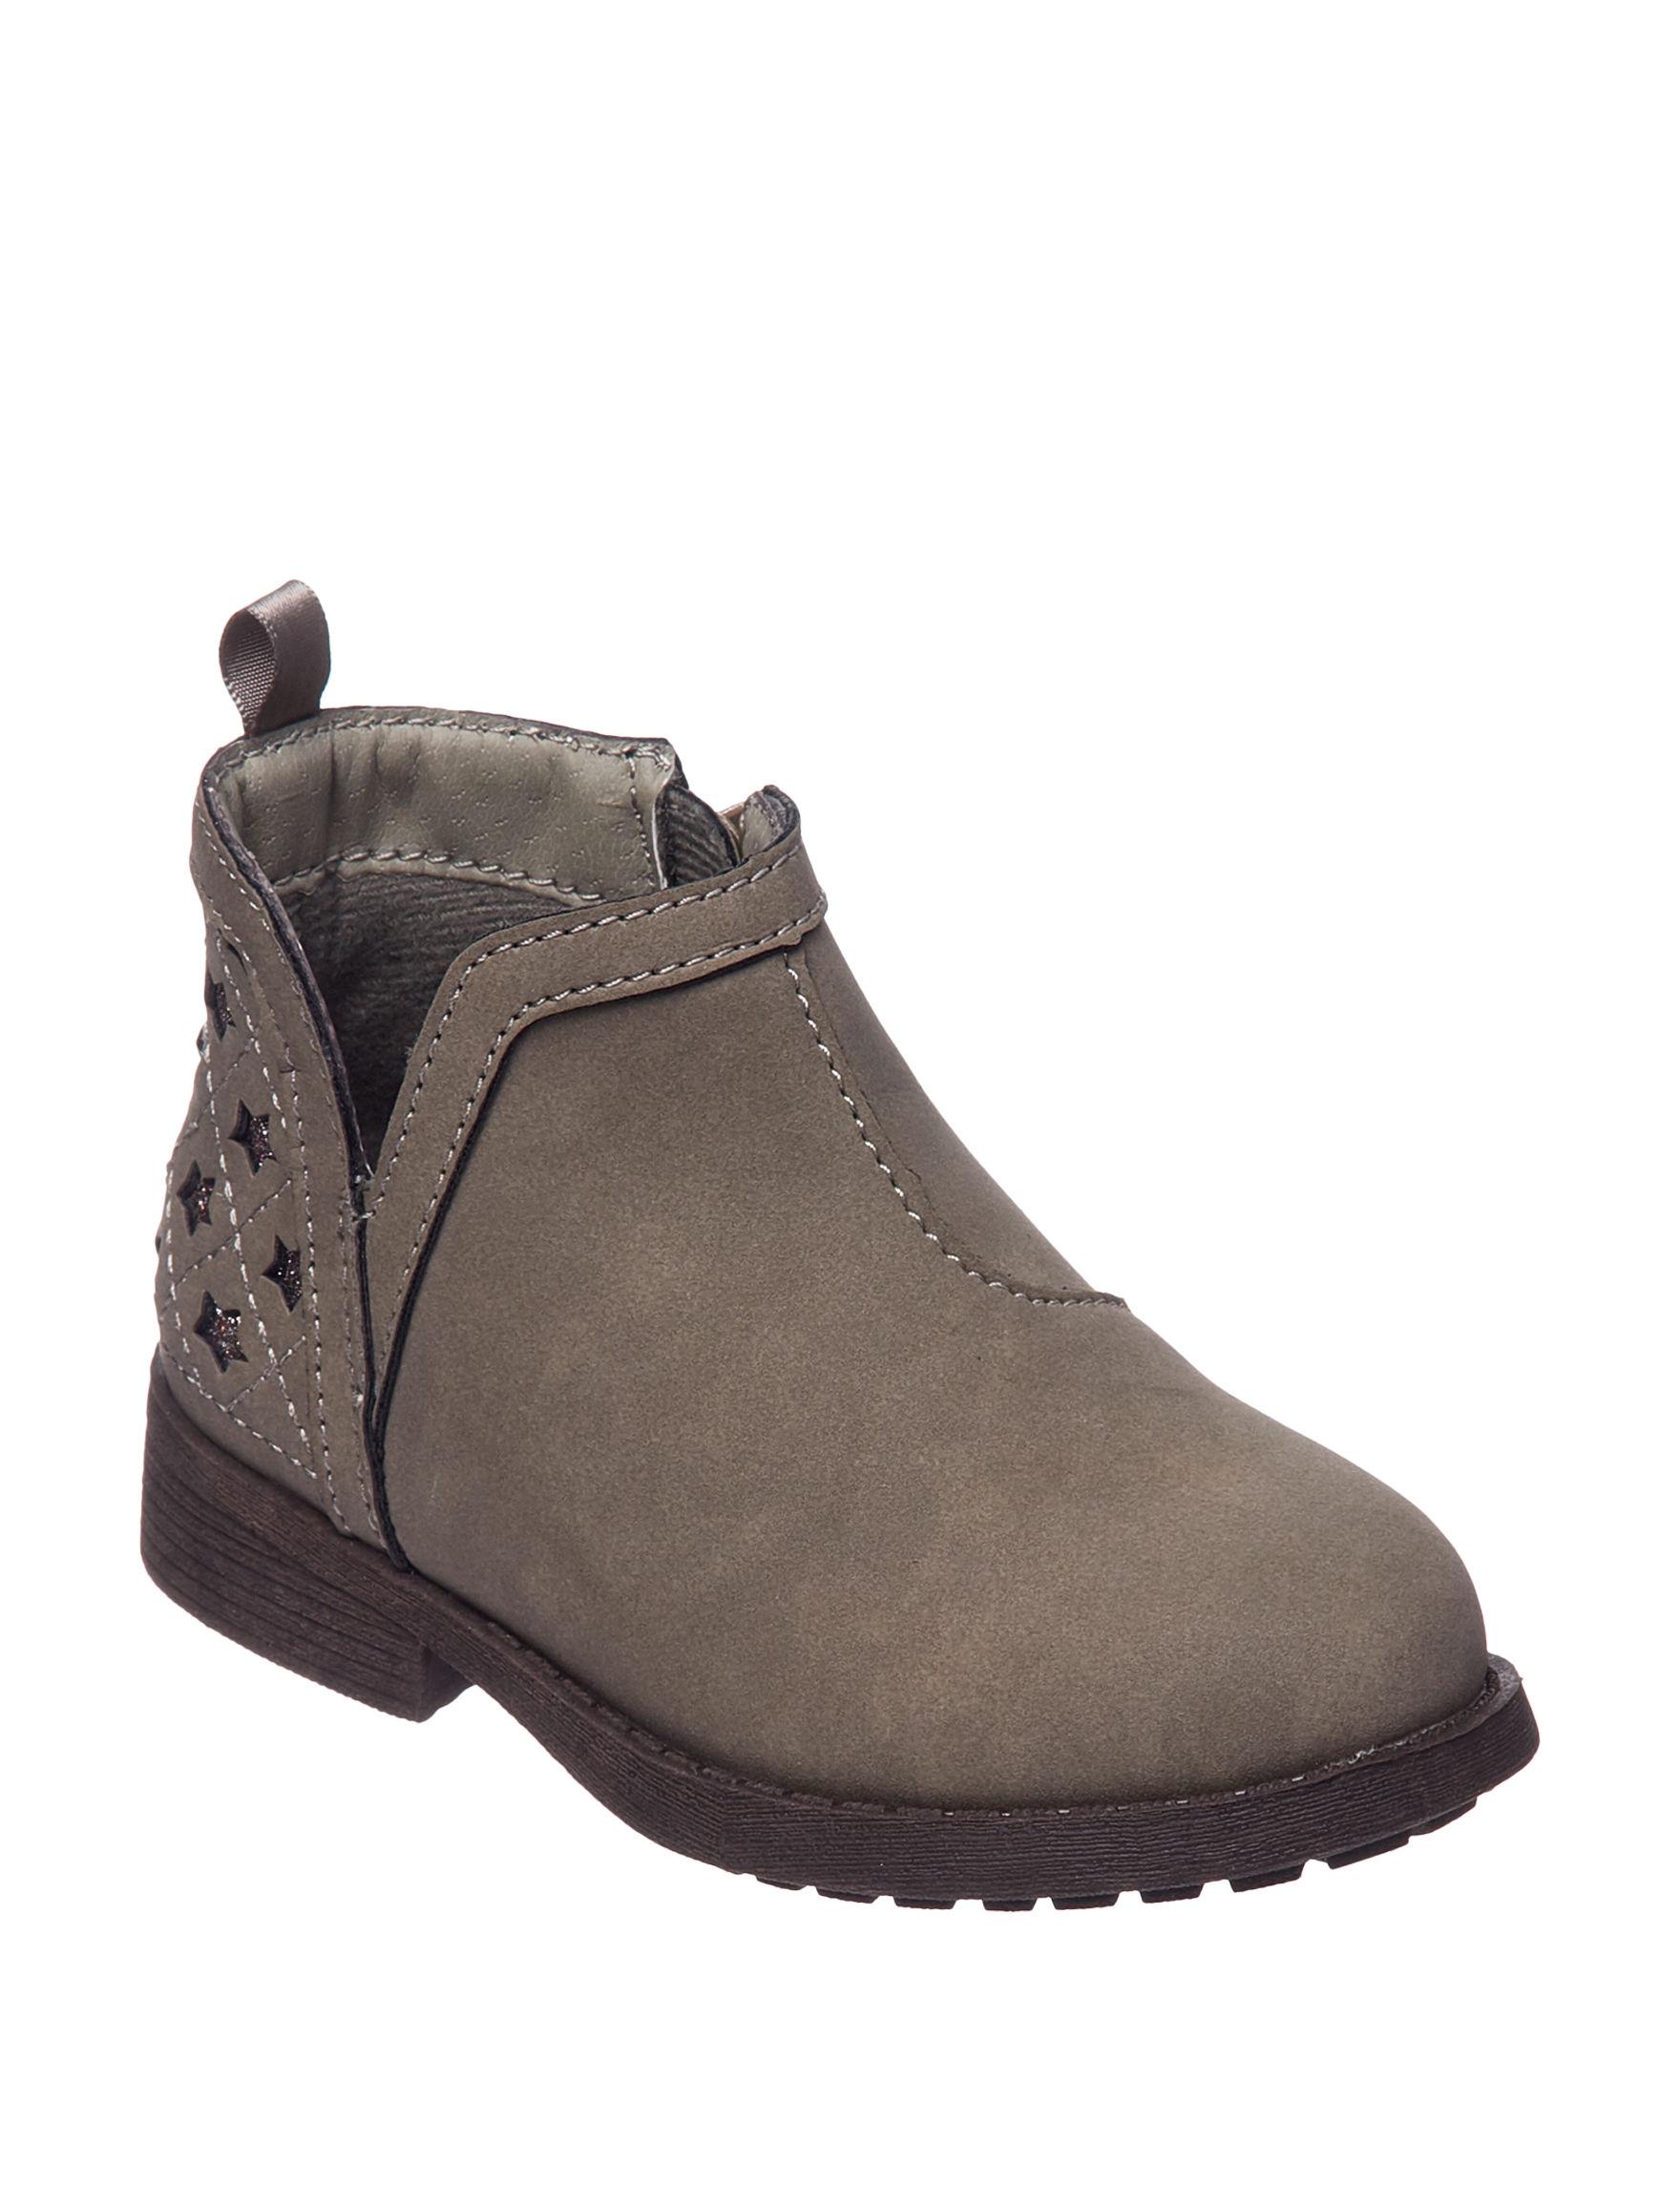 Oshkosh B'Gosh Taupe Ankle Boots & Booties